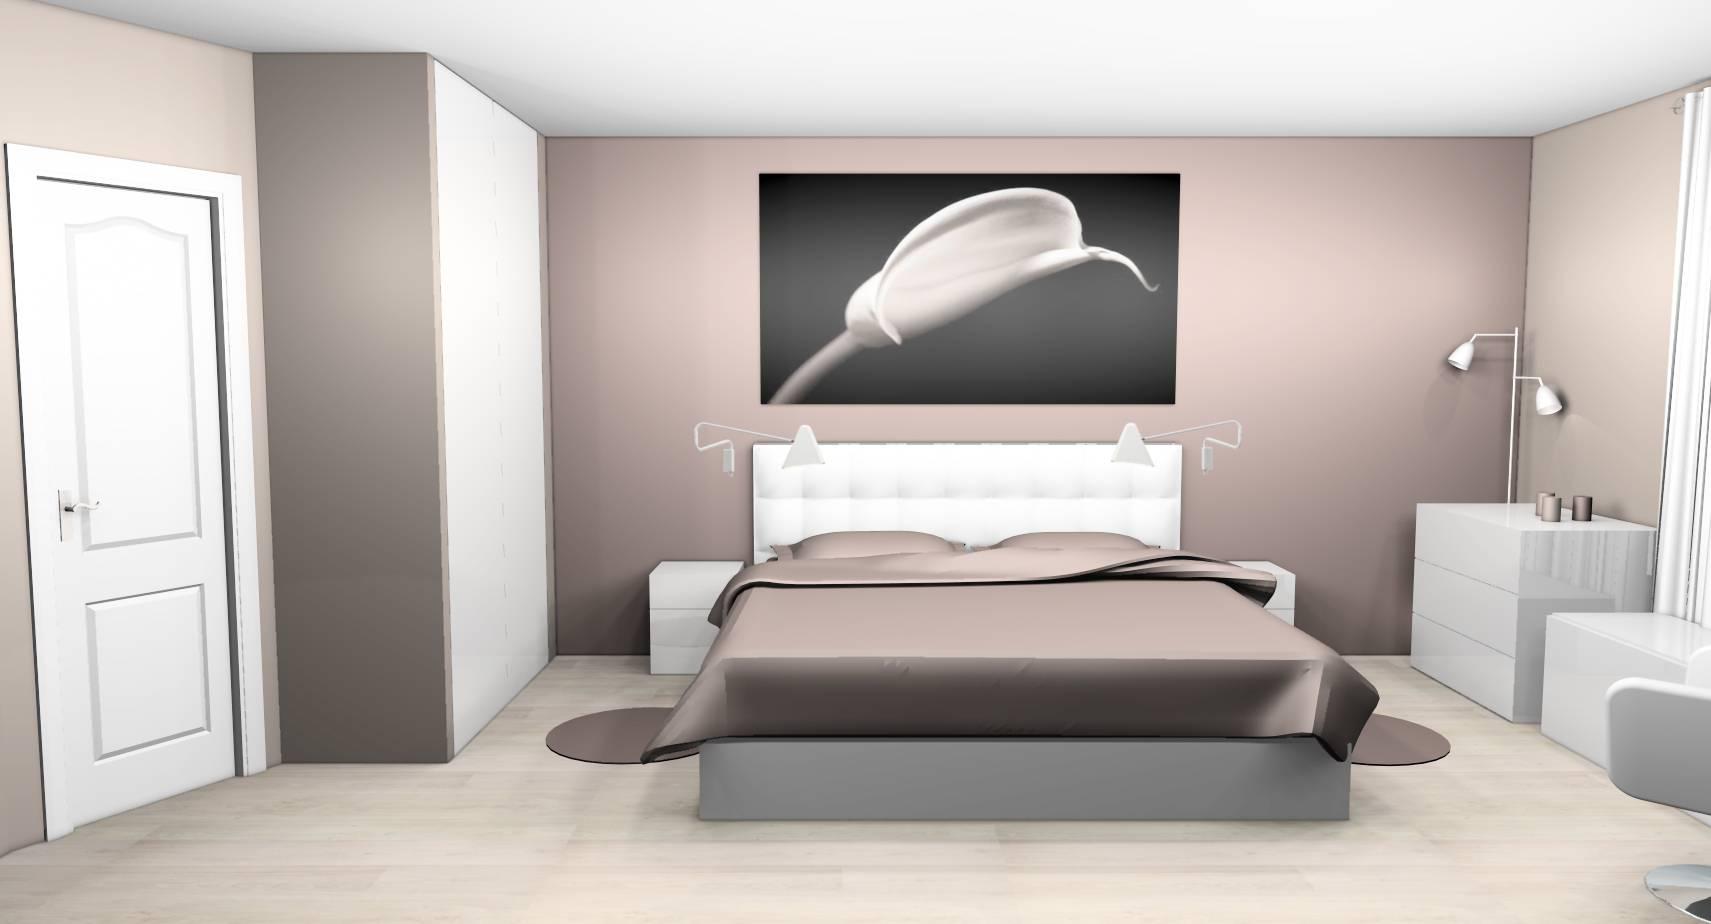 Chambres adultes Archives - Designement Vôtre